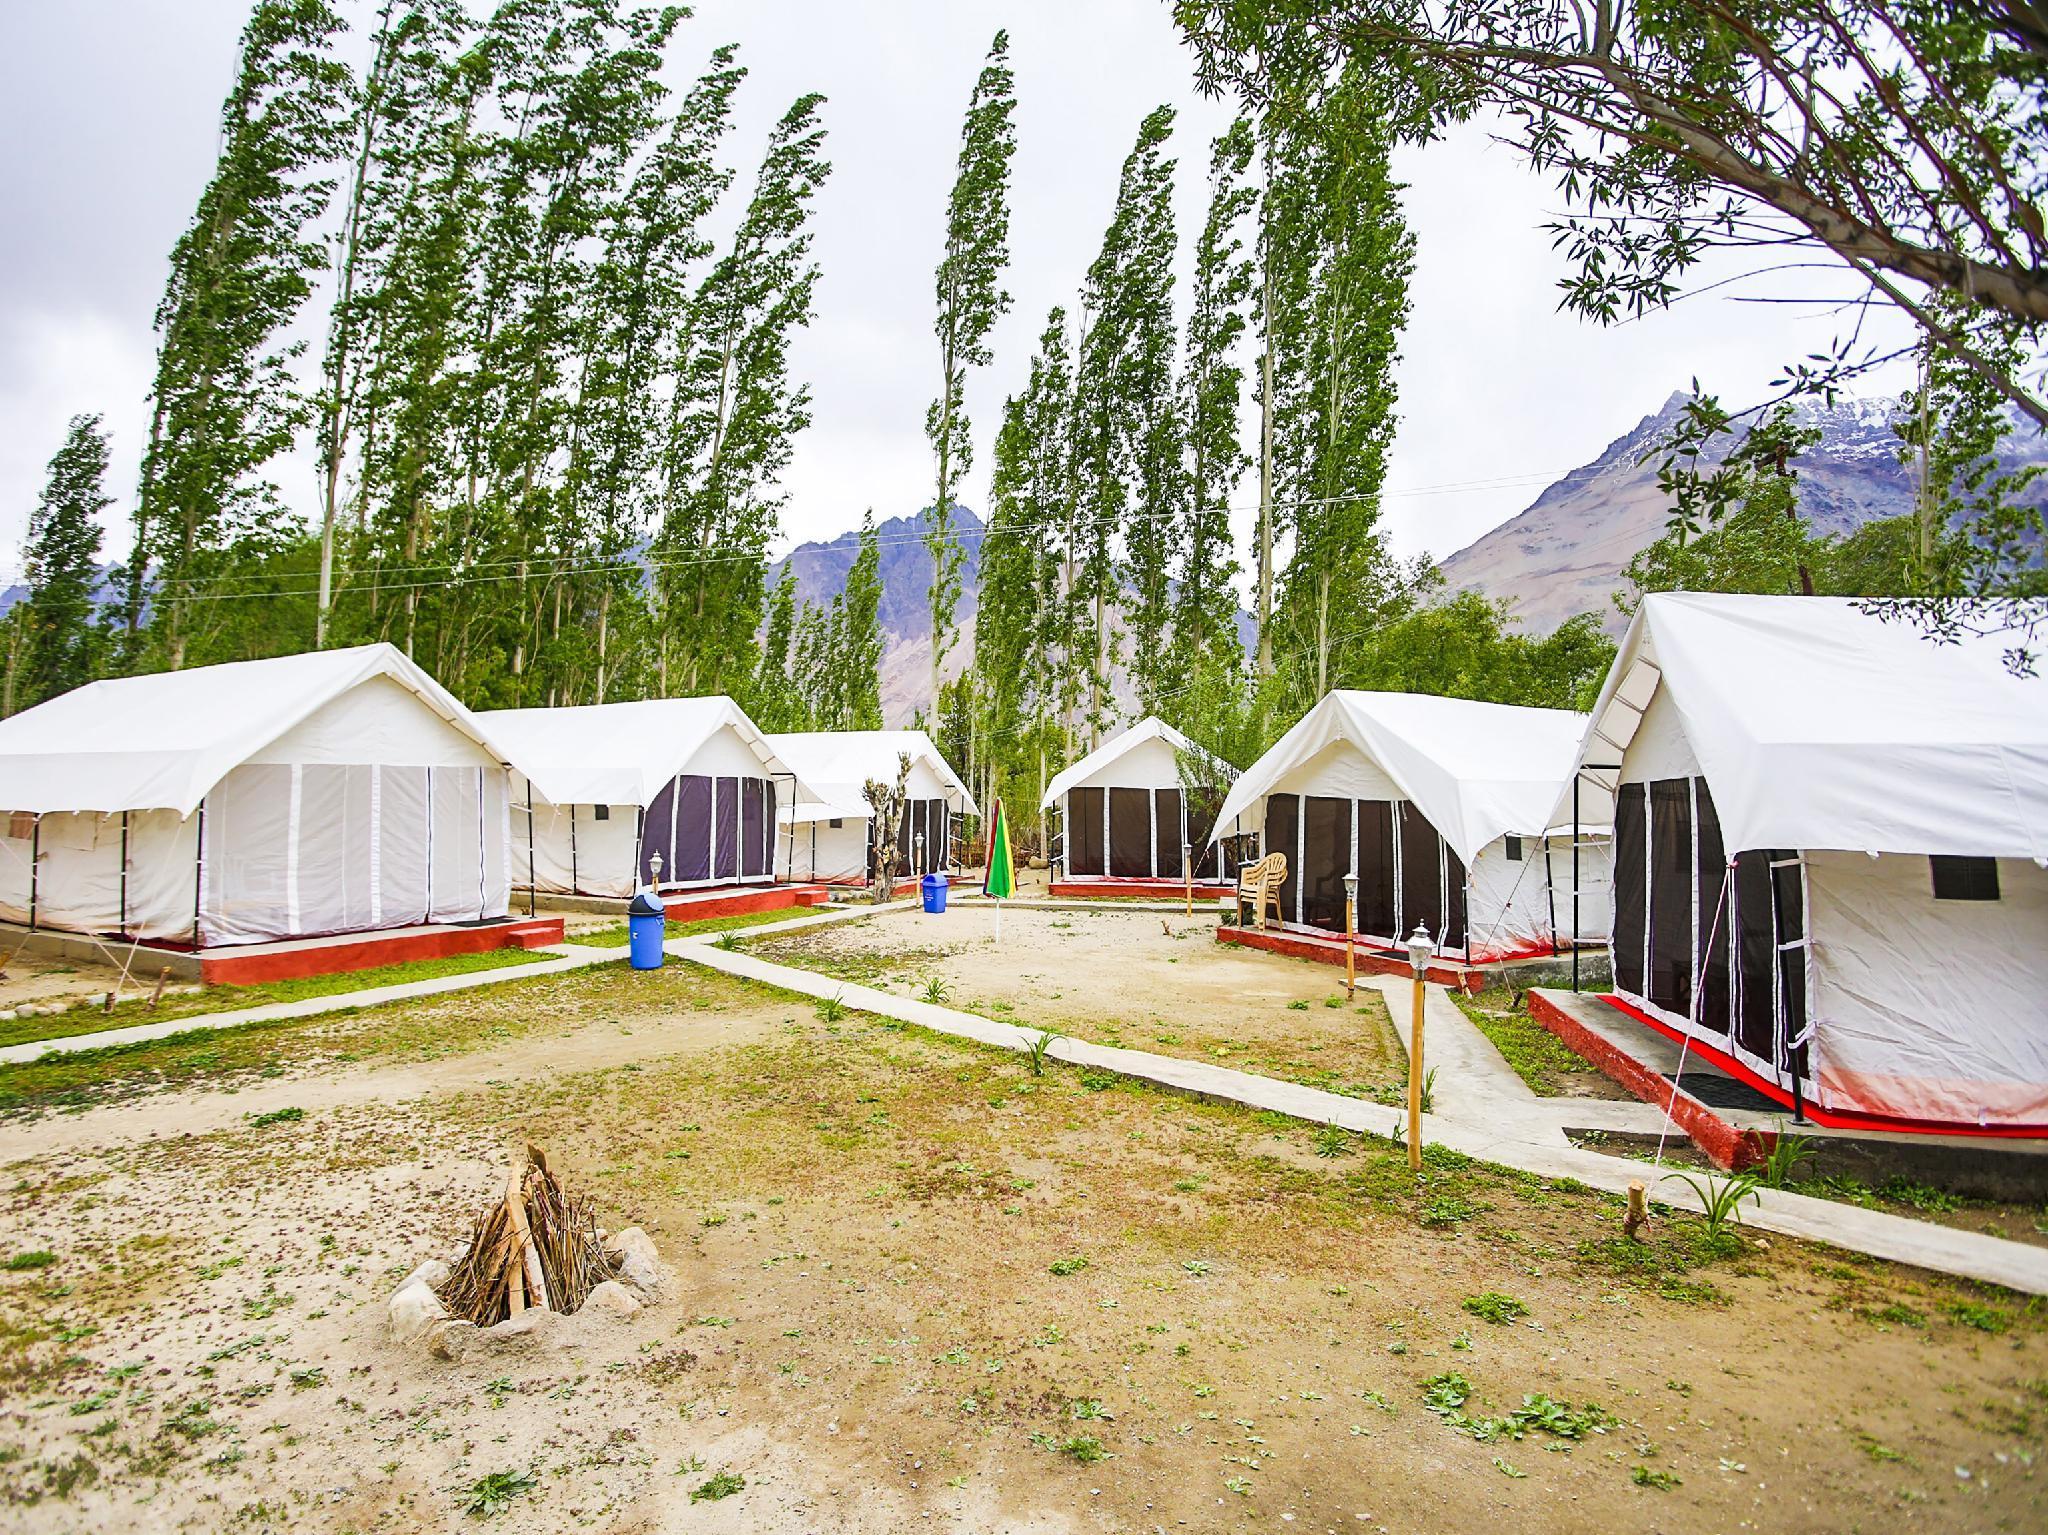 OYO 40829 Alpenglow Camp, Leh (Ladakh)